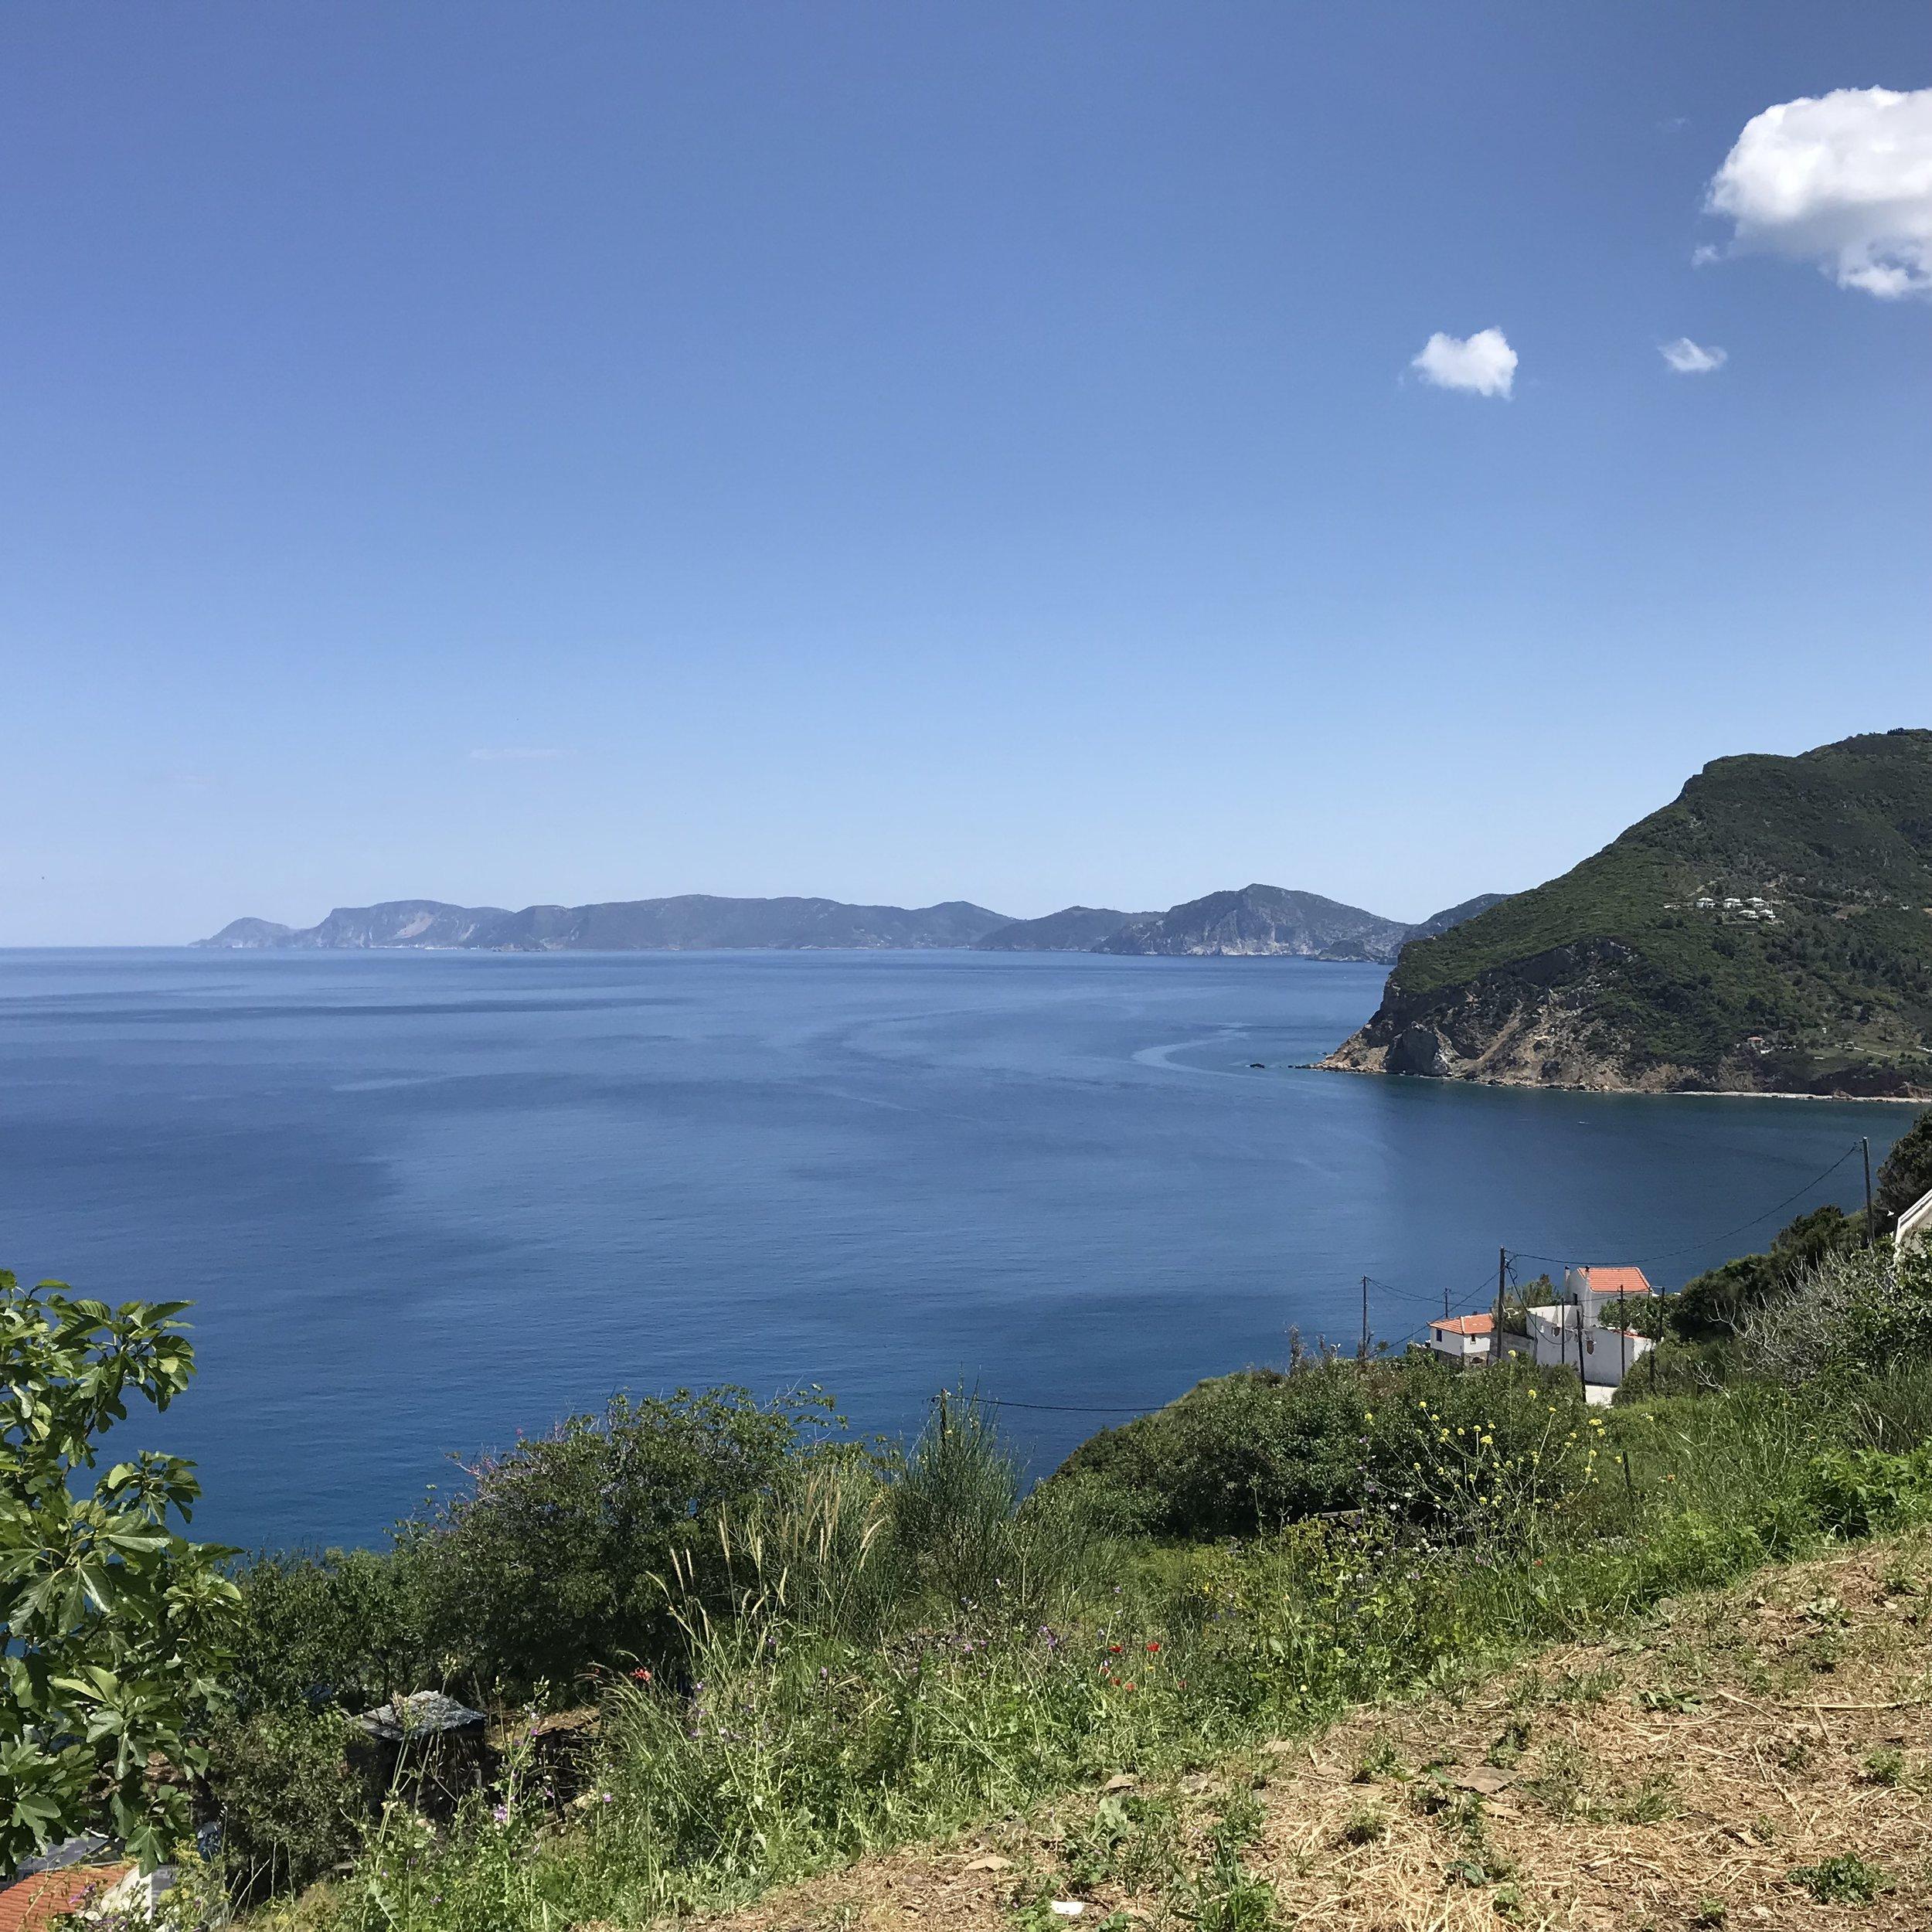 Greece1.jpeg